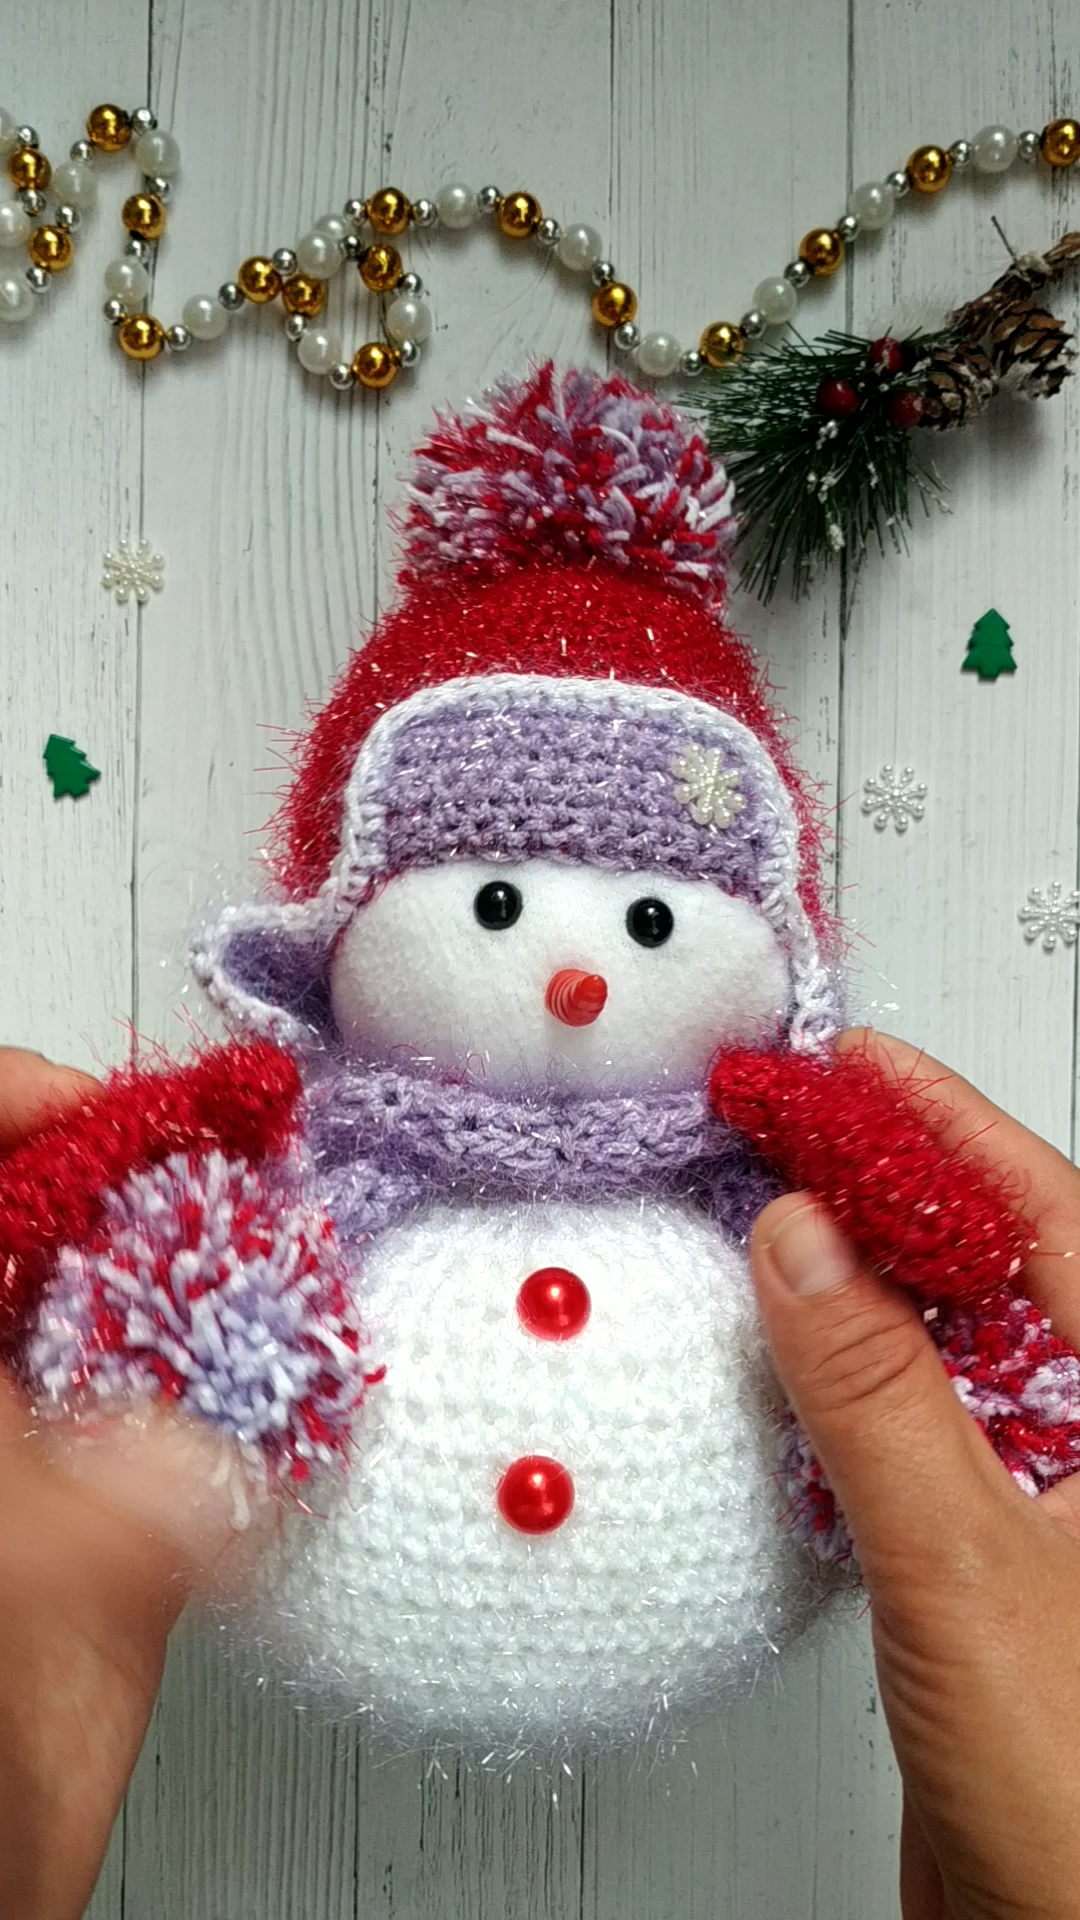 Photo of Snowman Christmas Snowman decor Snowman decor toy Snowman toy